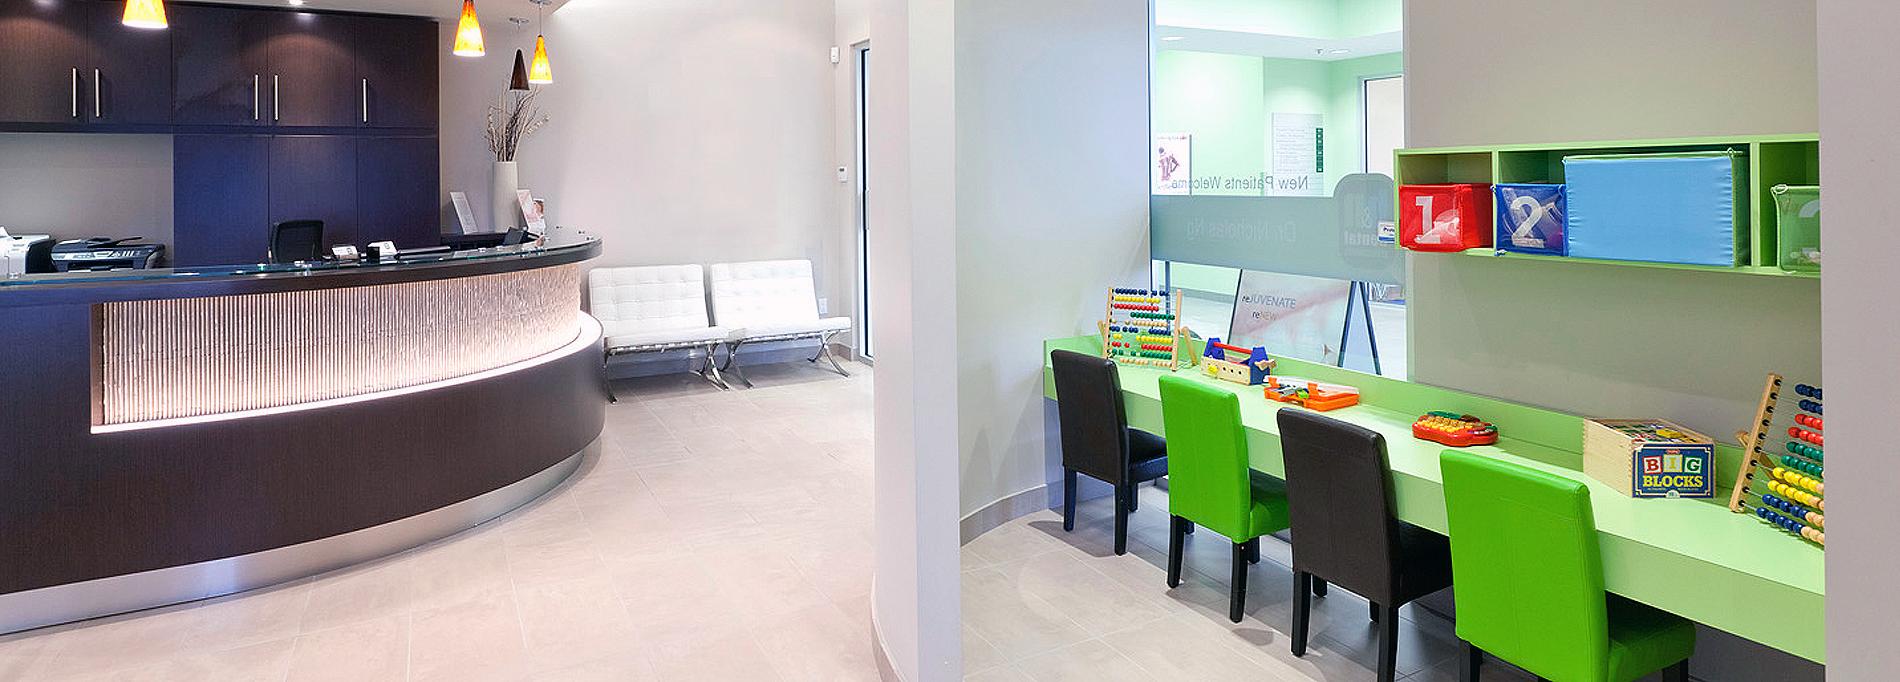 Mint Dental Clinic - Burlington Dentist Office - Kids Play Area